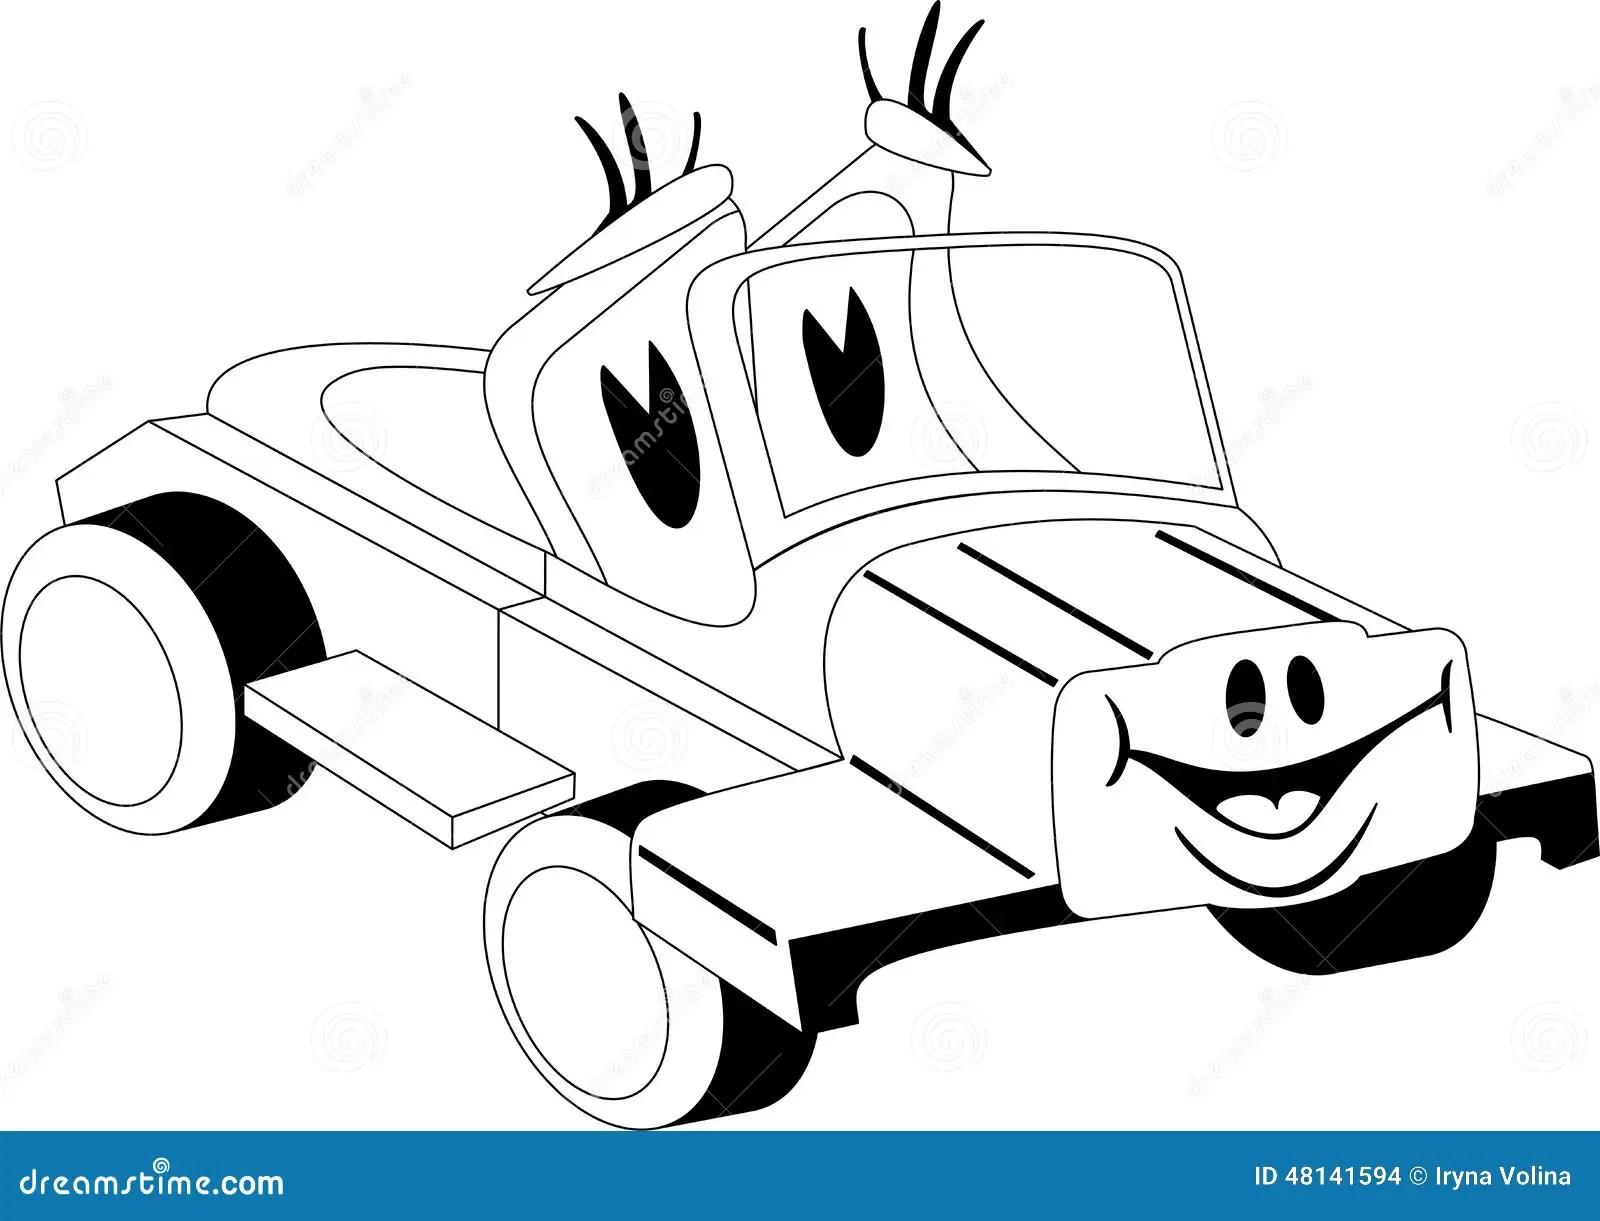 1991 Subaru Justy Wiring Harness. Subaru. Auto Wiring Diagram